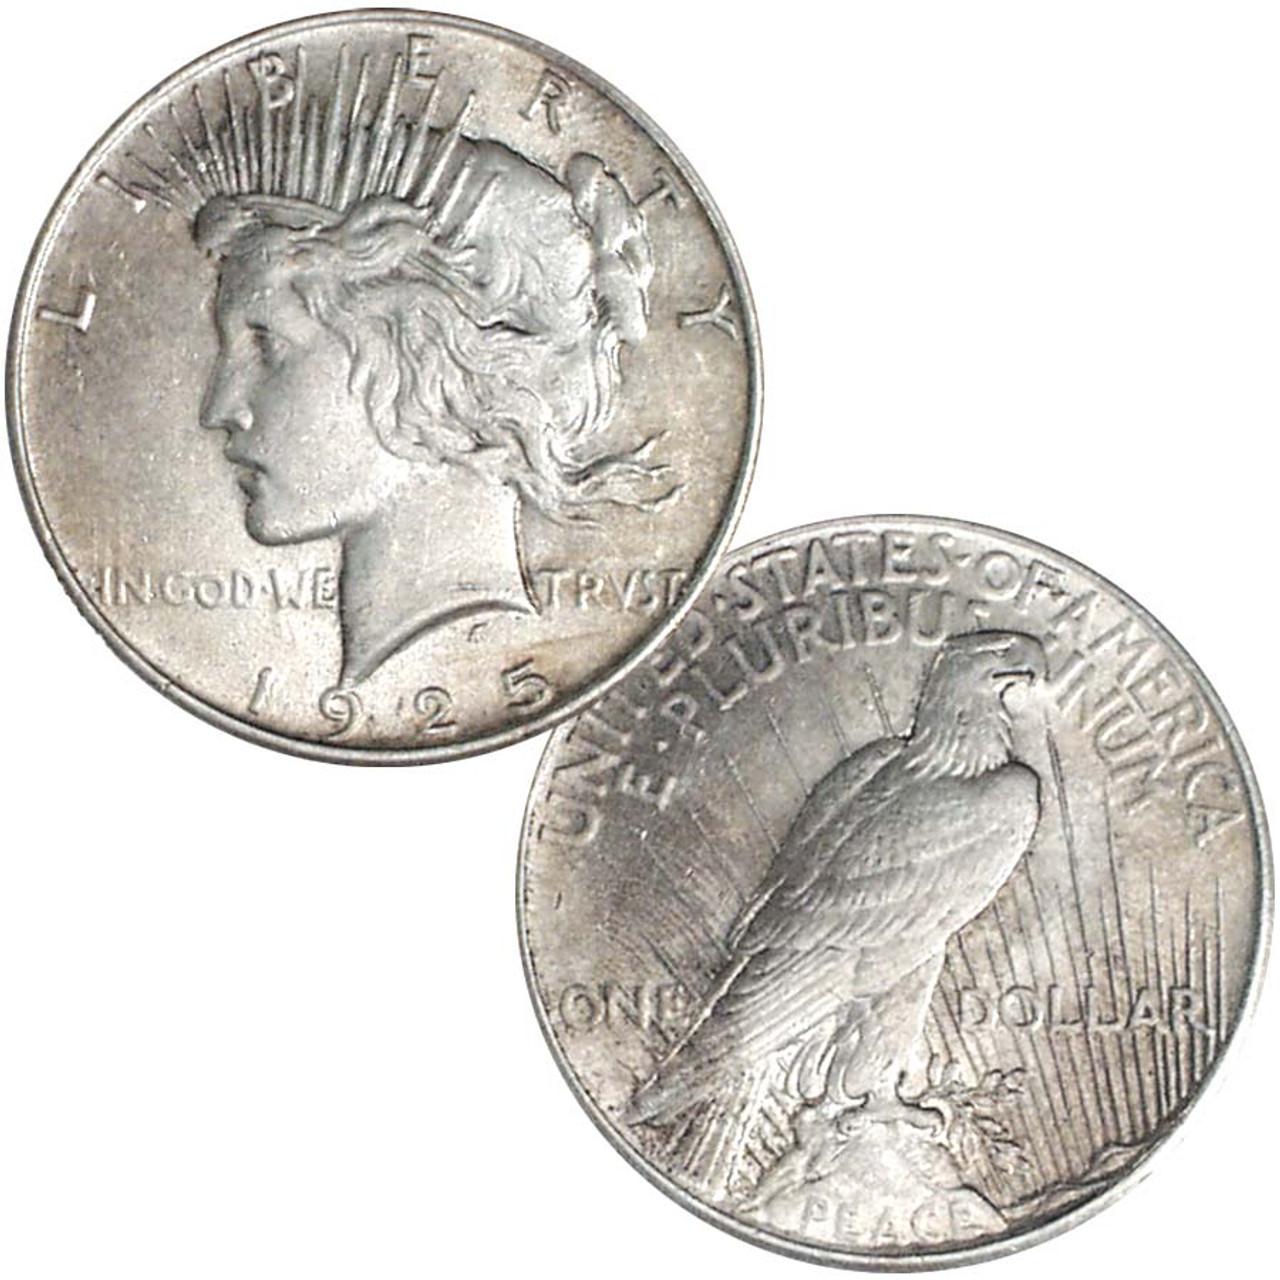 1925-P Peace Silver Dollar Very Fine Image 1